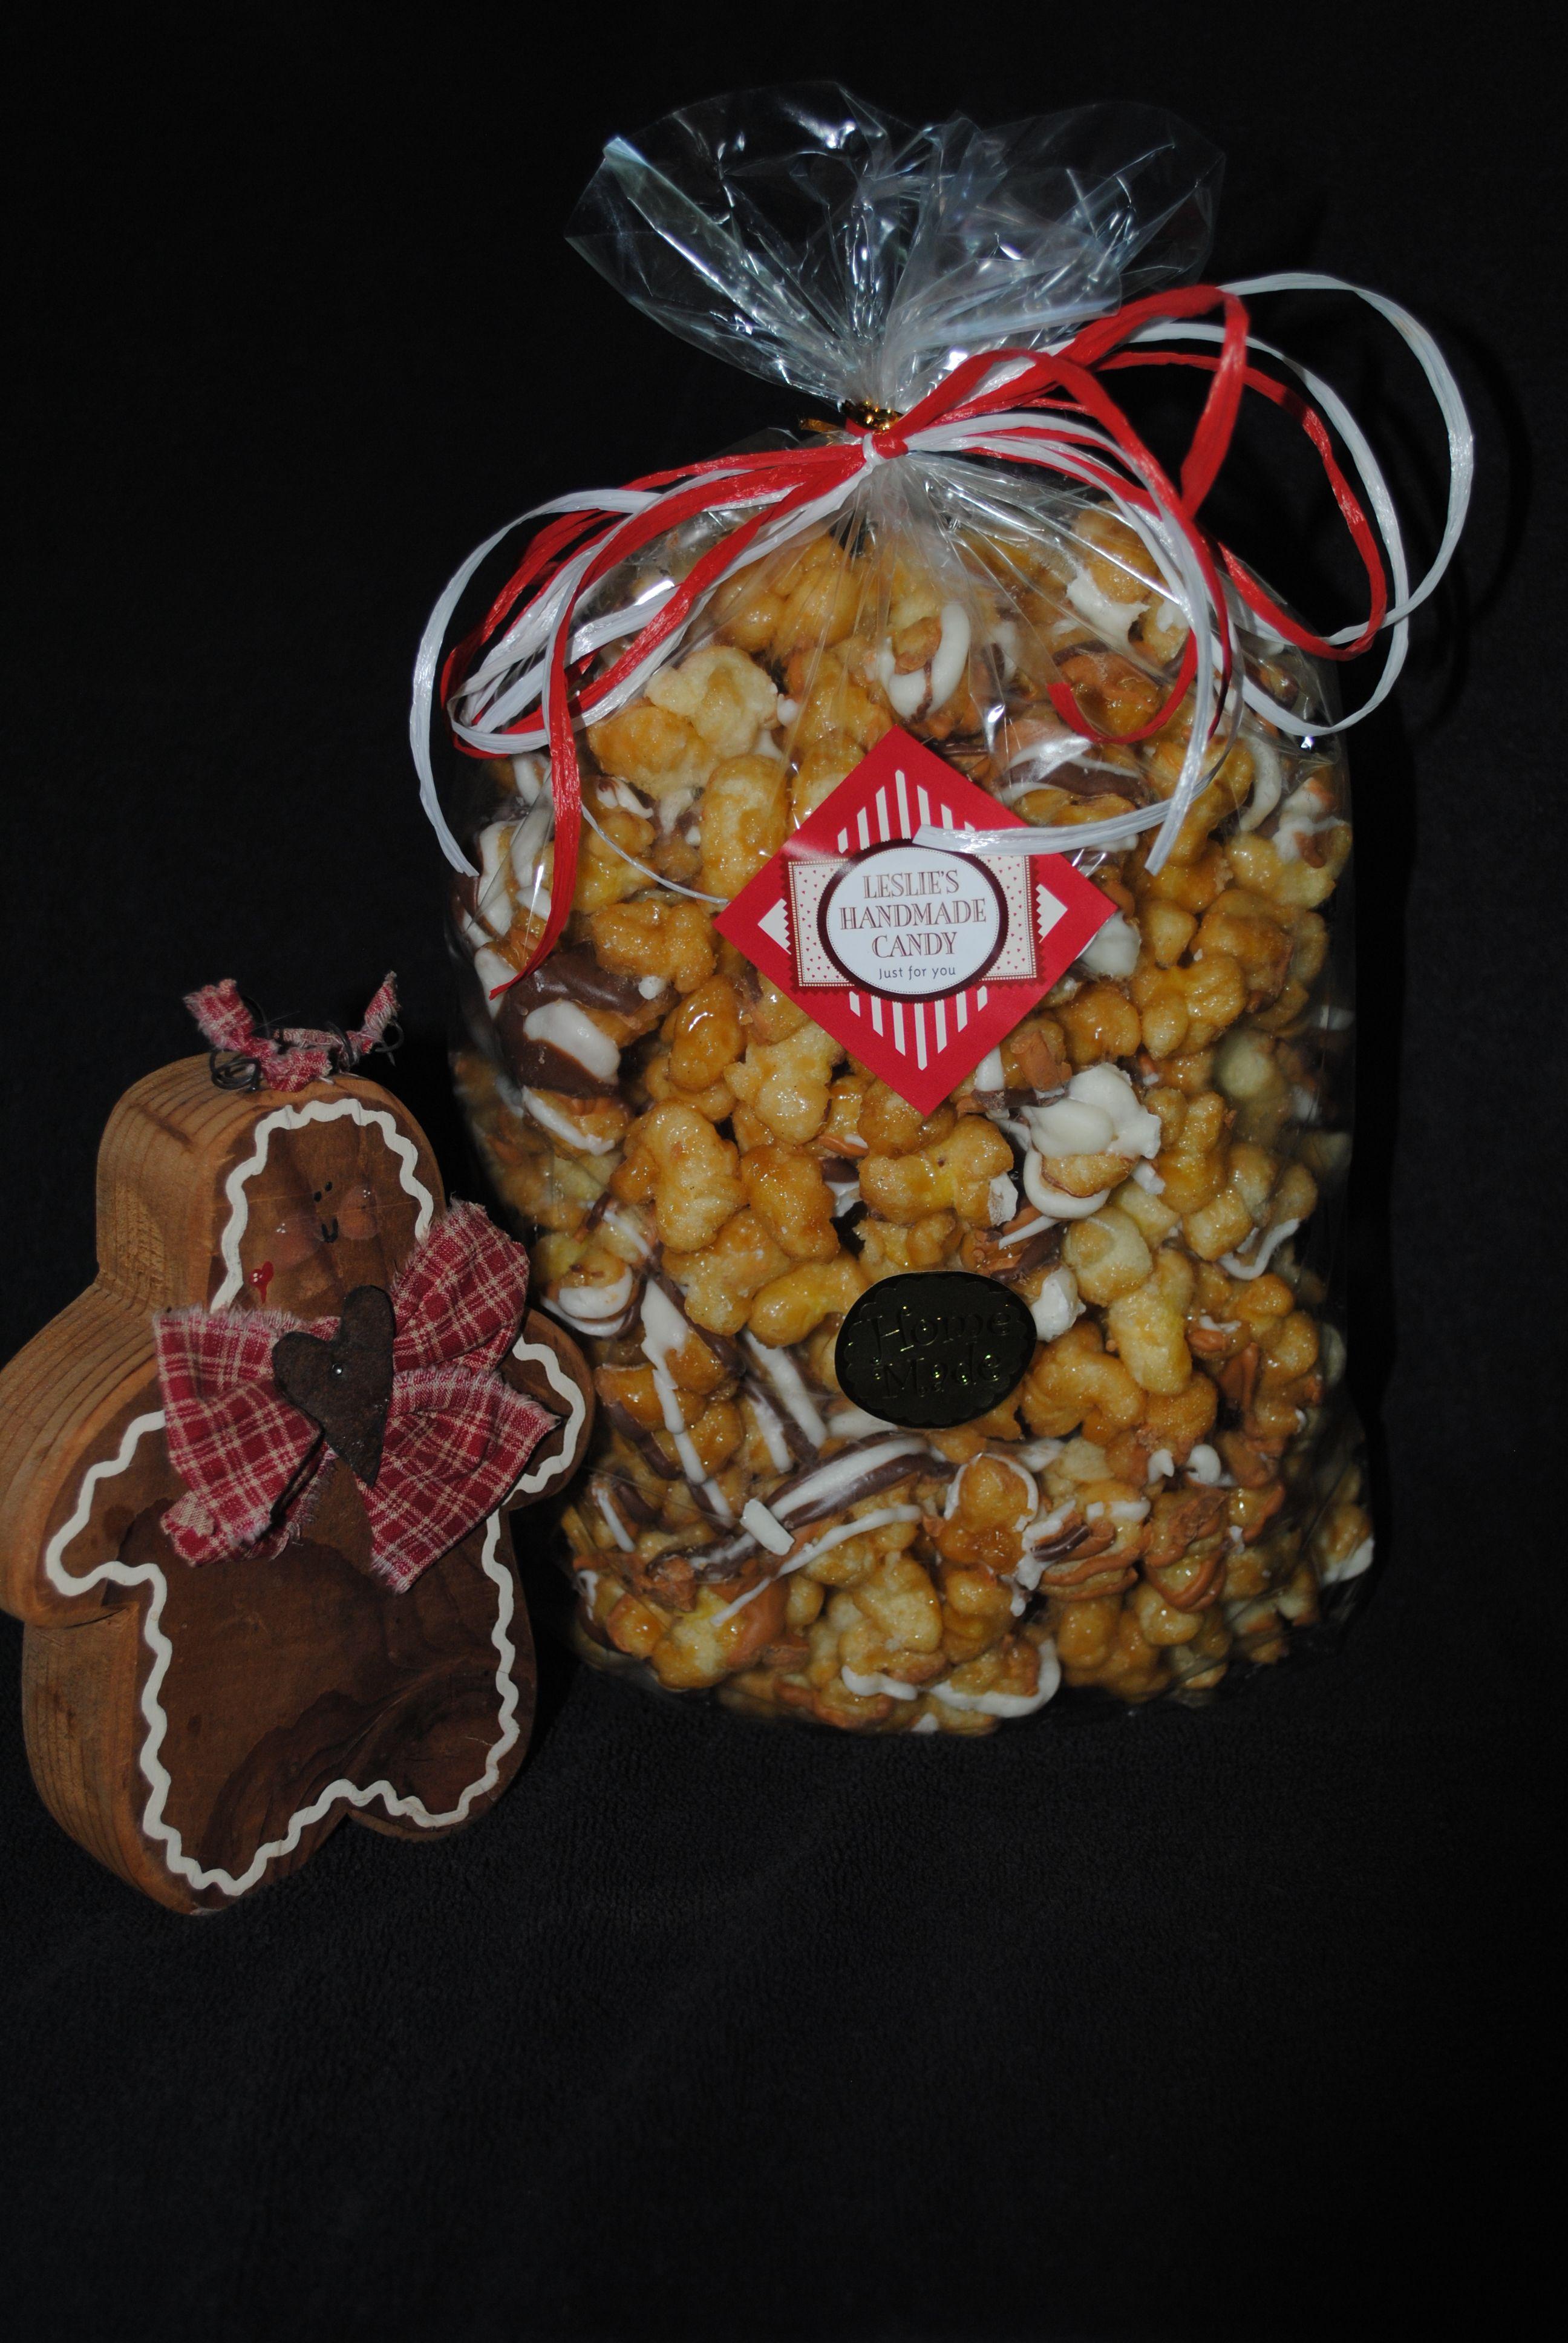 Yummy Handmade Puffed Caramel Corn. Peanut Butter & Chocolate, Birthday Cake Confetti & more... chocolatemade4u@gmail.com